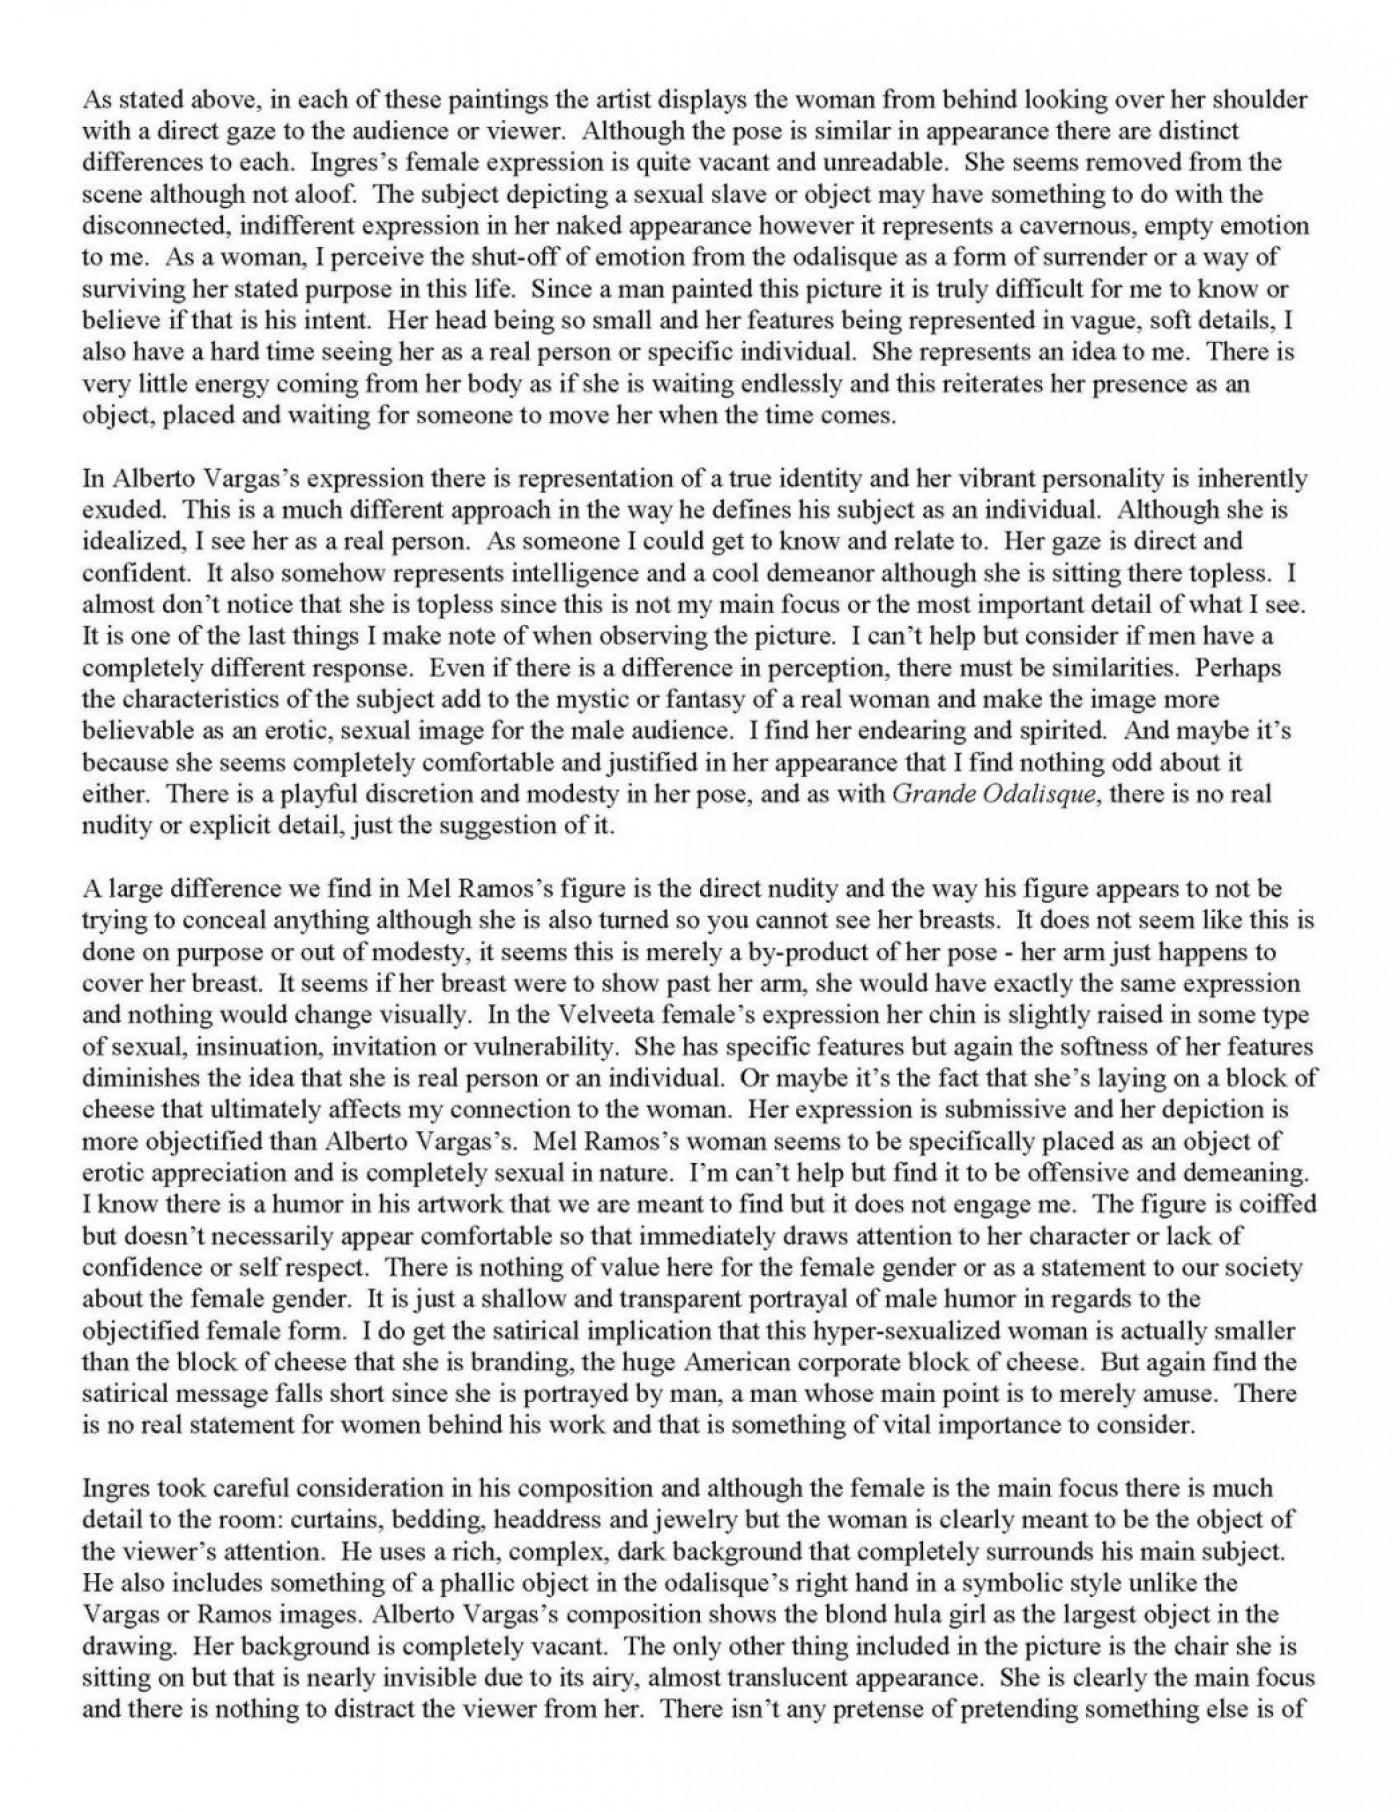 007 Essay Example Visual Examples Of Analysis Essays Outline Movie Visualanalysisfinaldraft P Image Sample Rhetorical Text